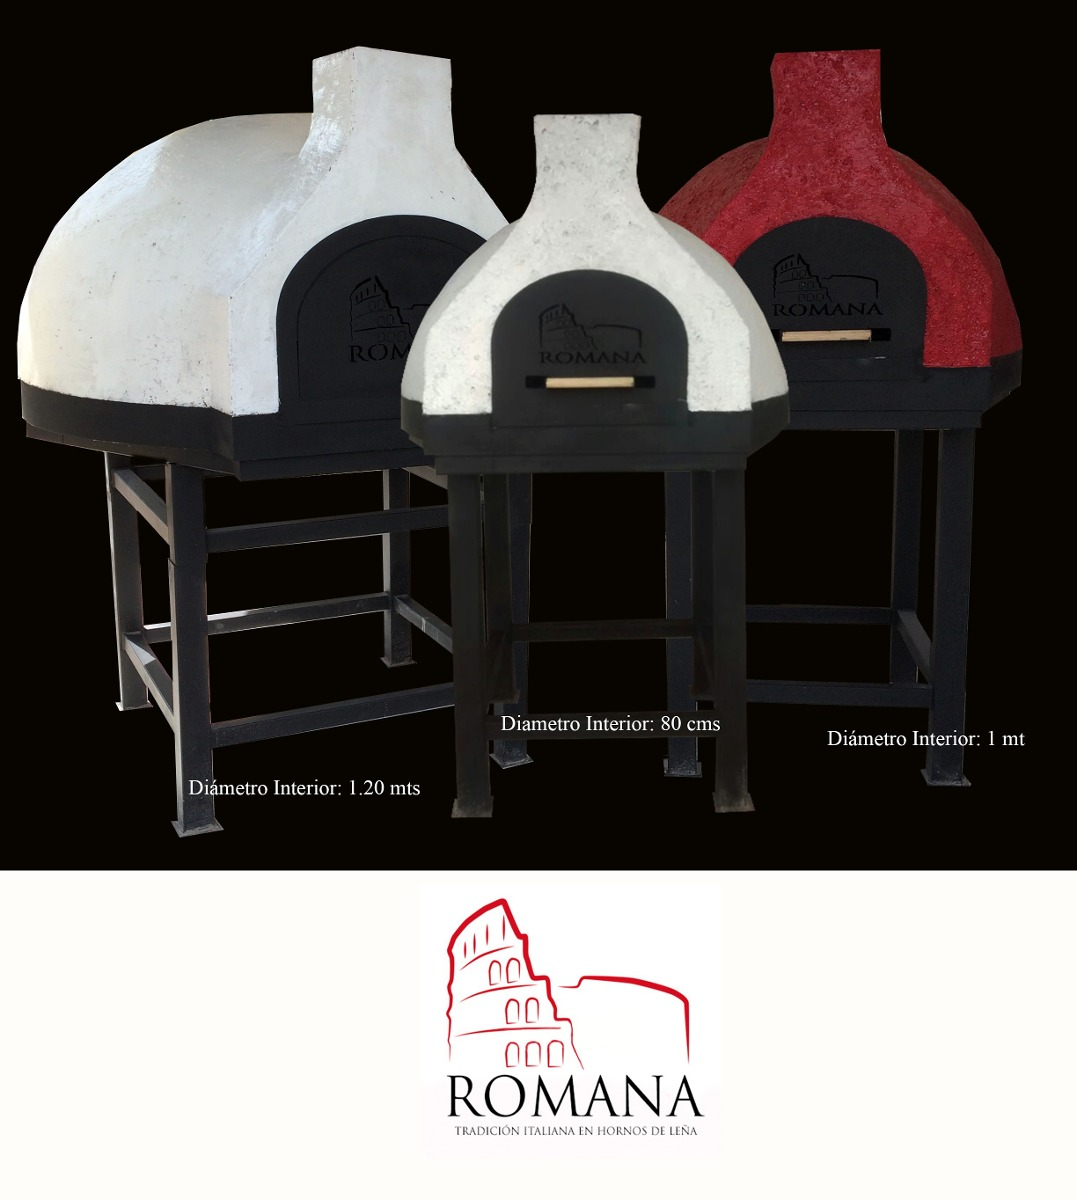 Arco Gas >> Hornos De Leña Estilo Italiano Para Pizza Y Pan - $ 31,500.00 en Mercado Libre